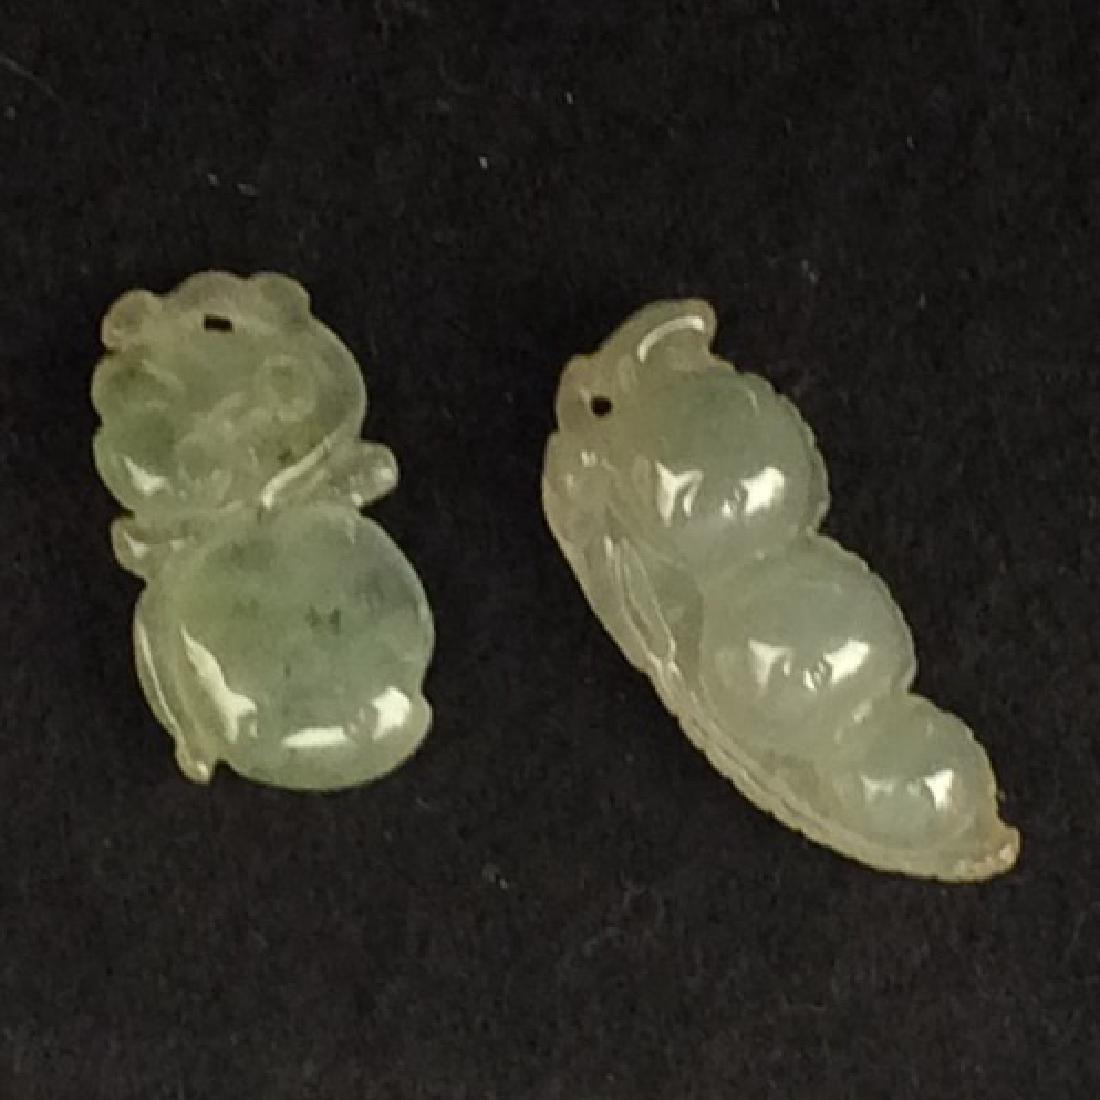 Set of 2 White Jadeite Pendants, Pea Pod/Fruit